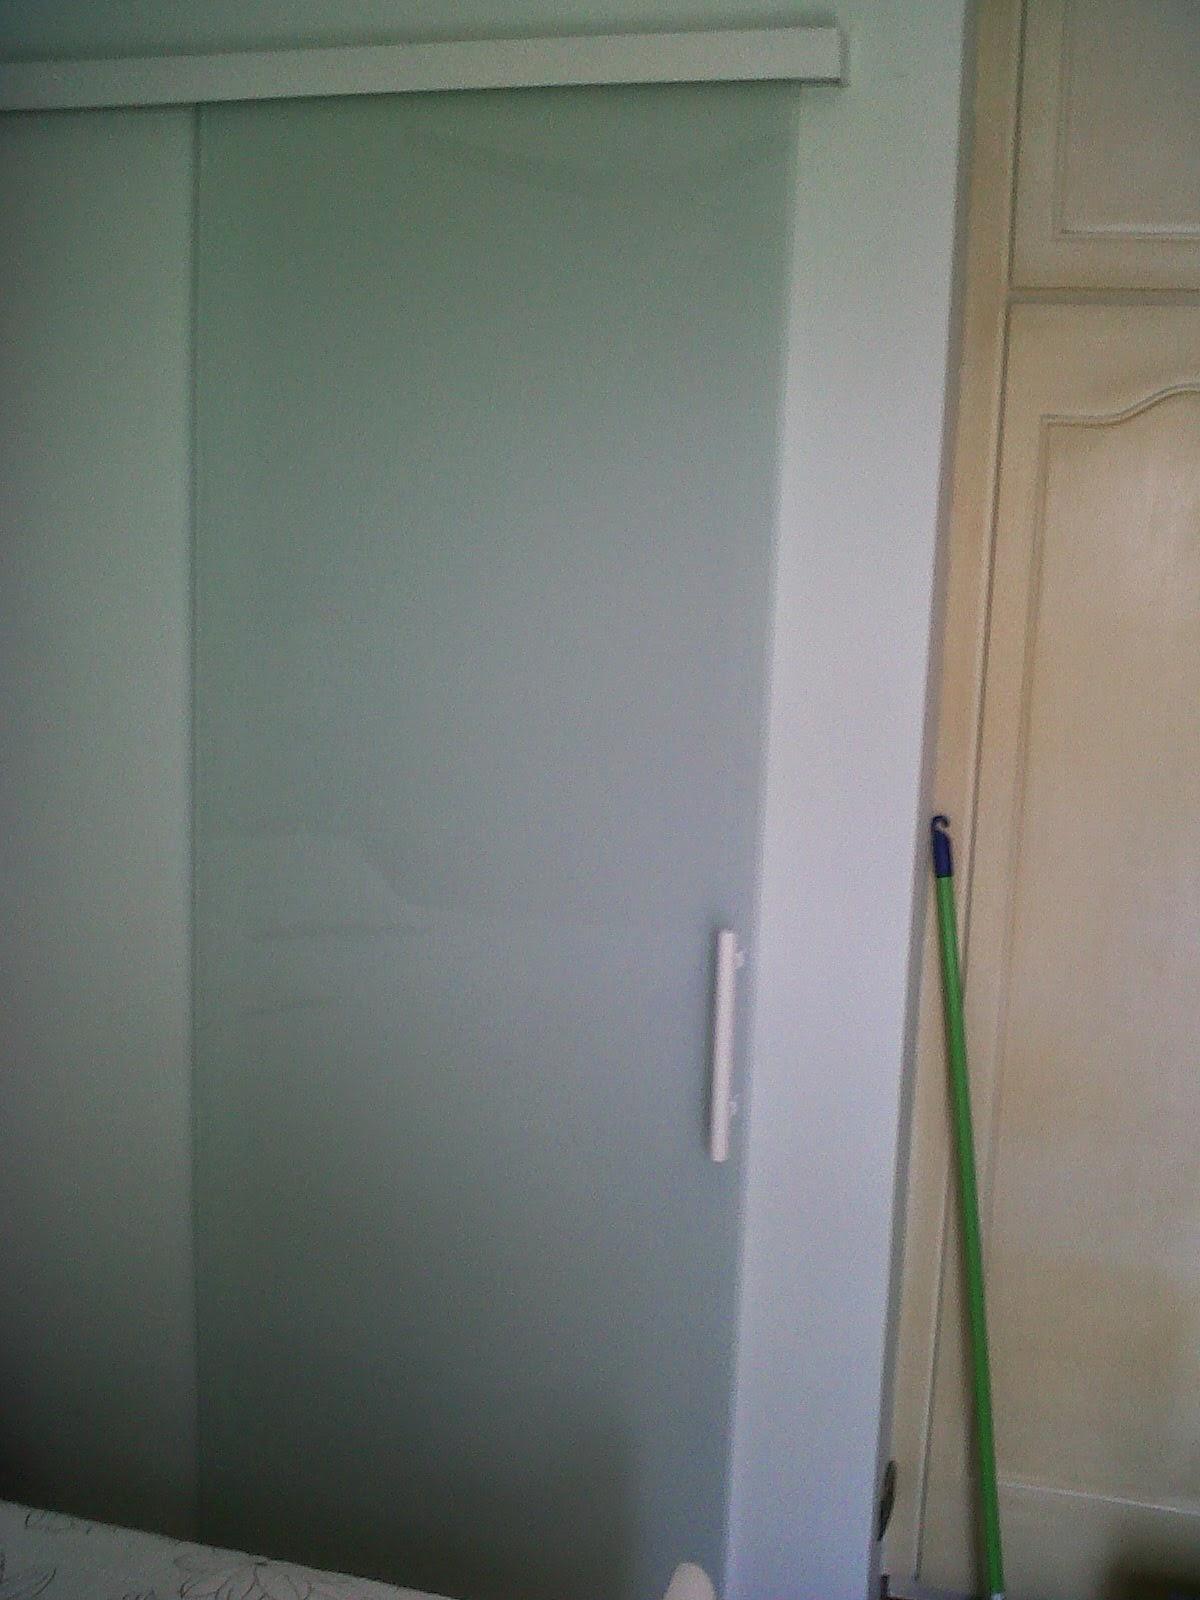 #766355 AF4 TEMPER VIDROS: Porta de correr serigrafada branco leitoso 1642 Janela De Aluminio Lavanderia